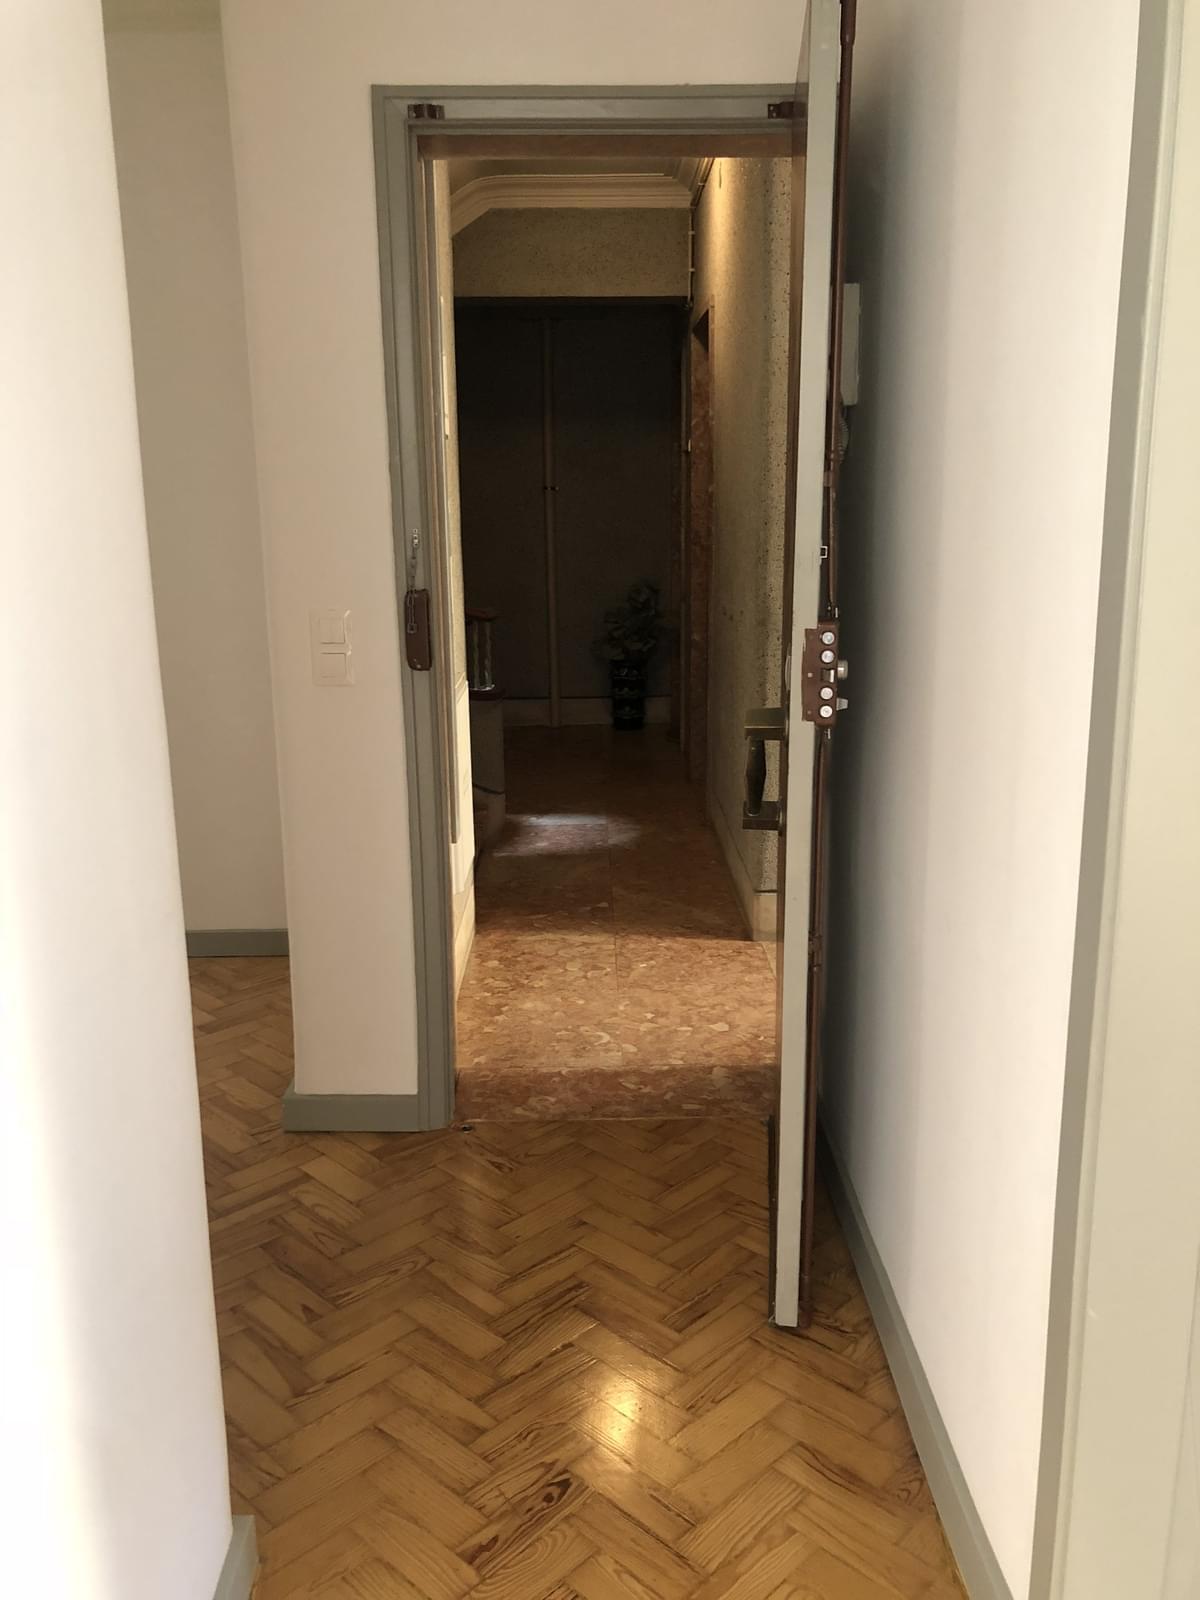 pf17234-apartamento-t3-lisboa-c2d96175-6e88-4a53-b8e2-37a2a0070da7